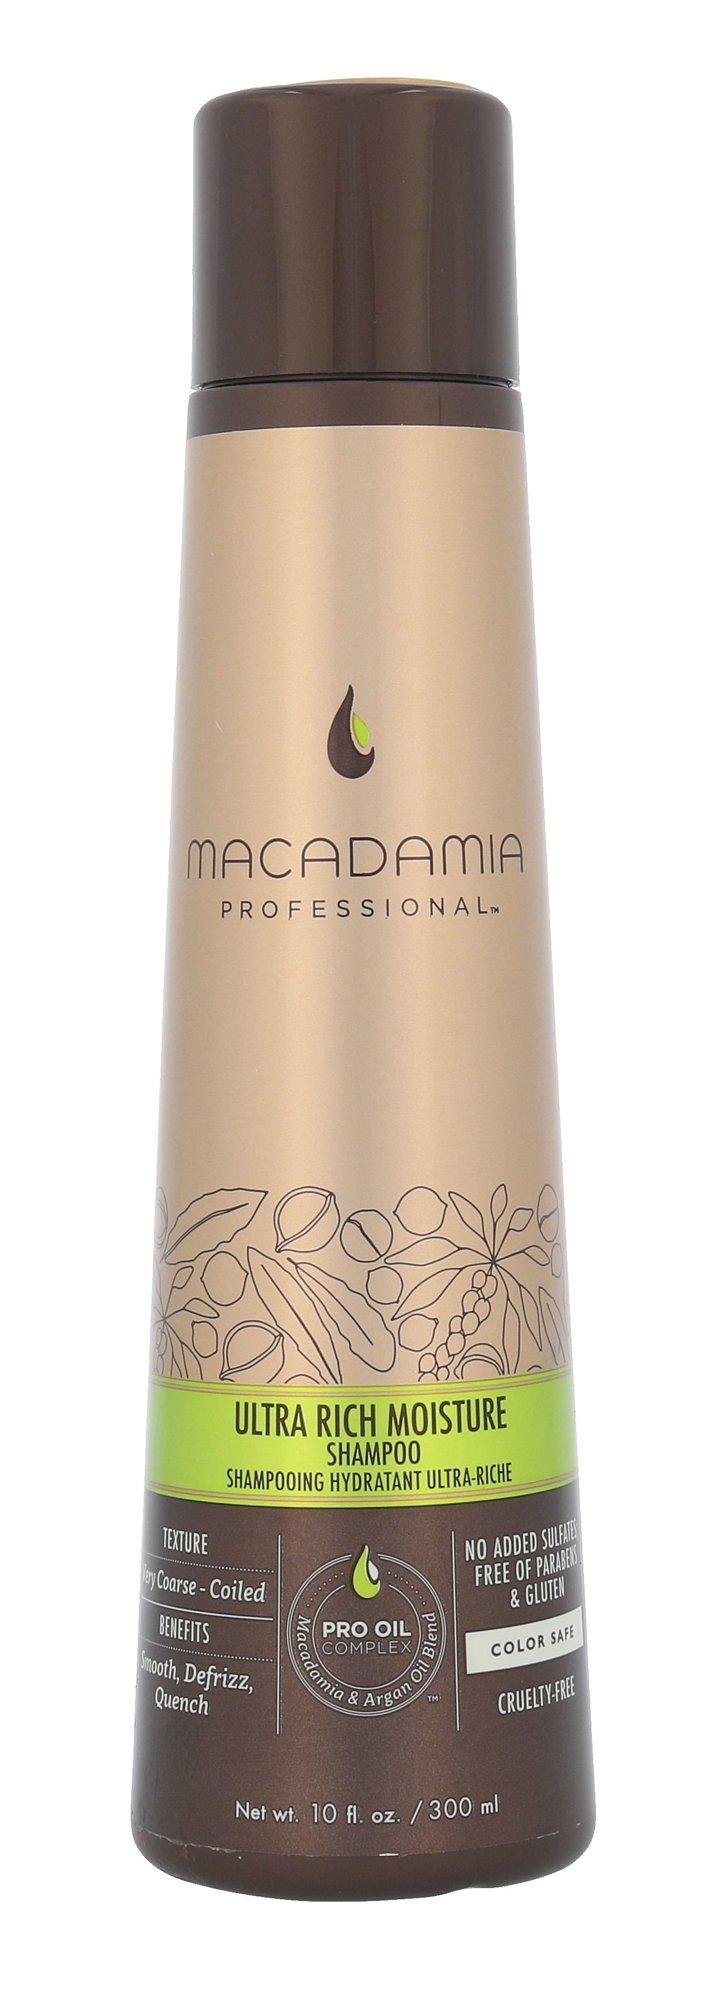 Macadamia Ultra Rich Moisture Shampoo Cosmetic 300ml